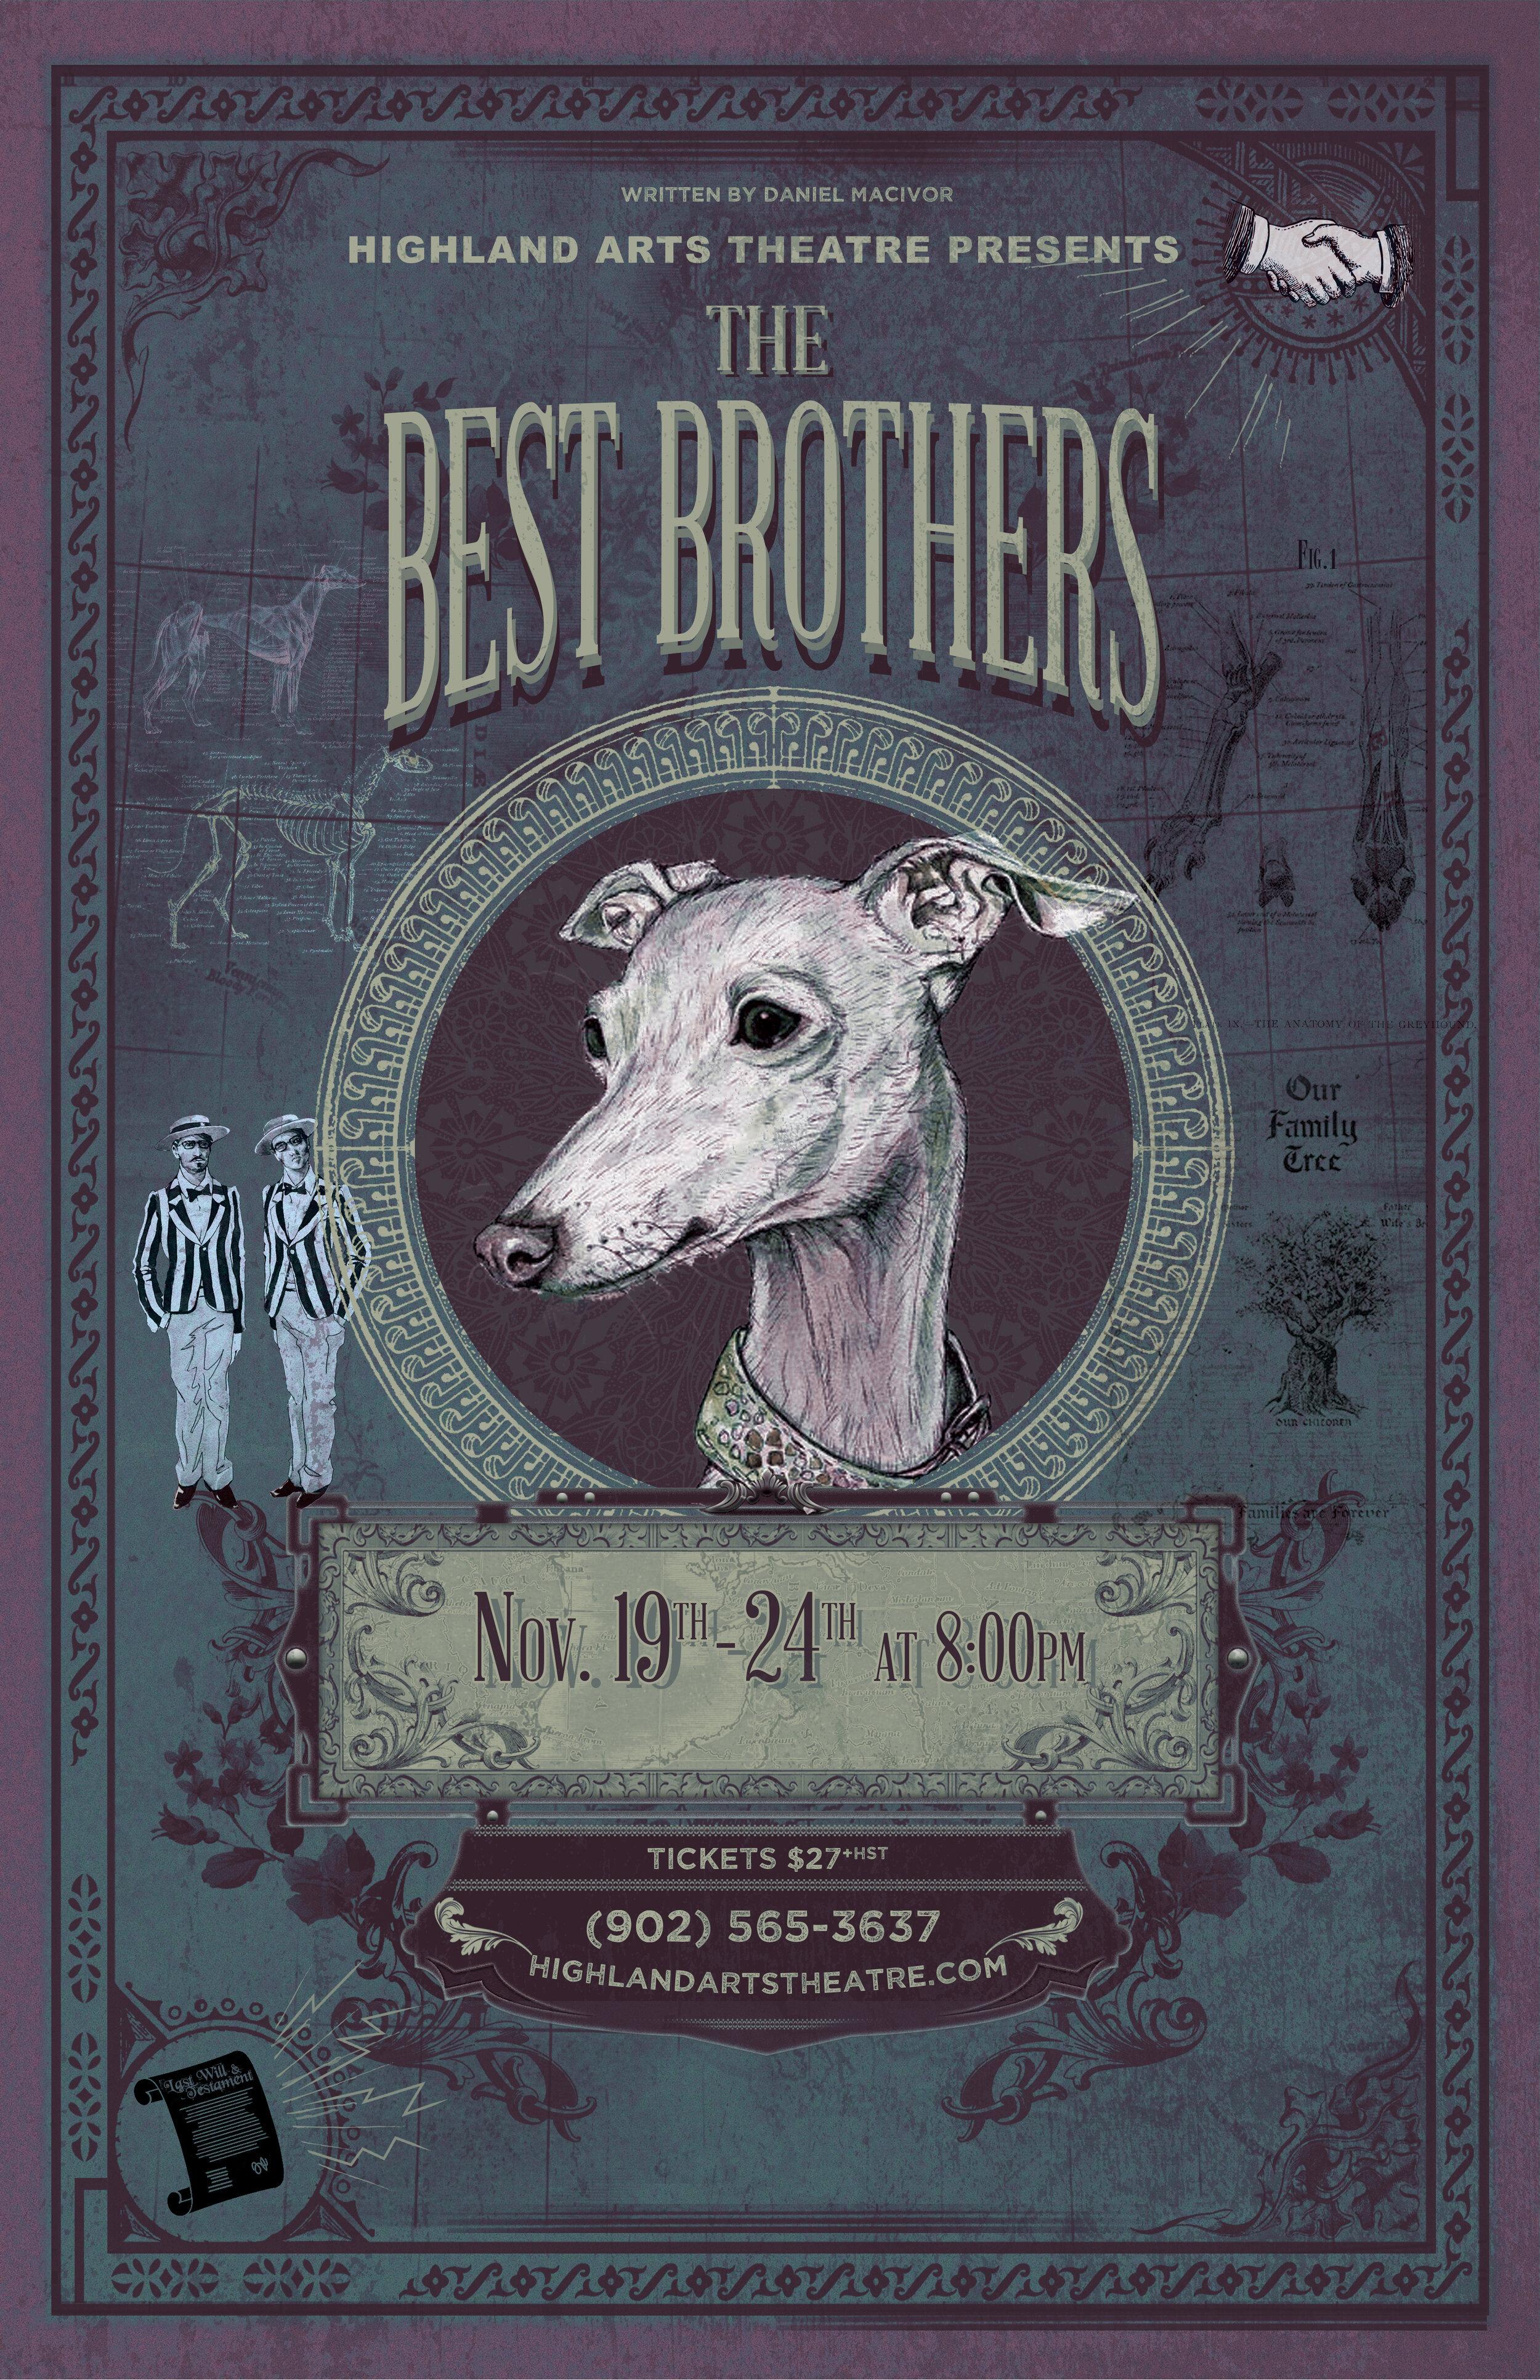 BestBrothers_POSTER.jpg